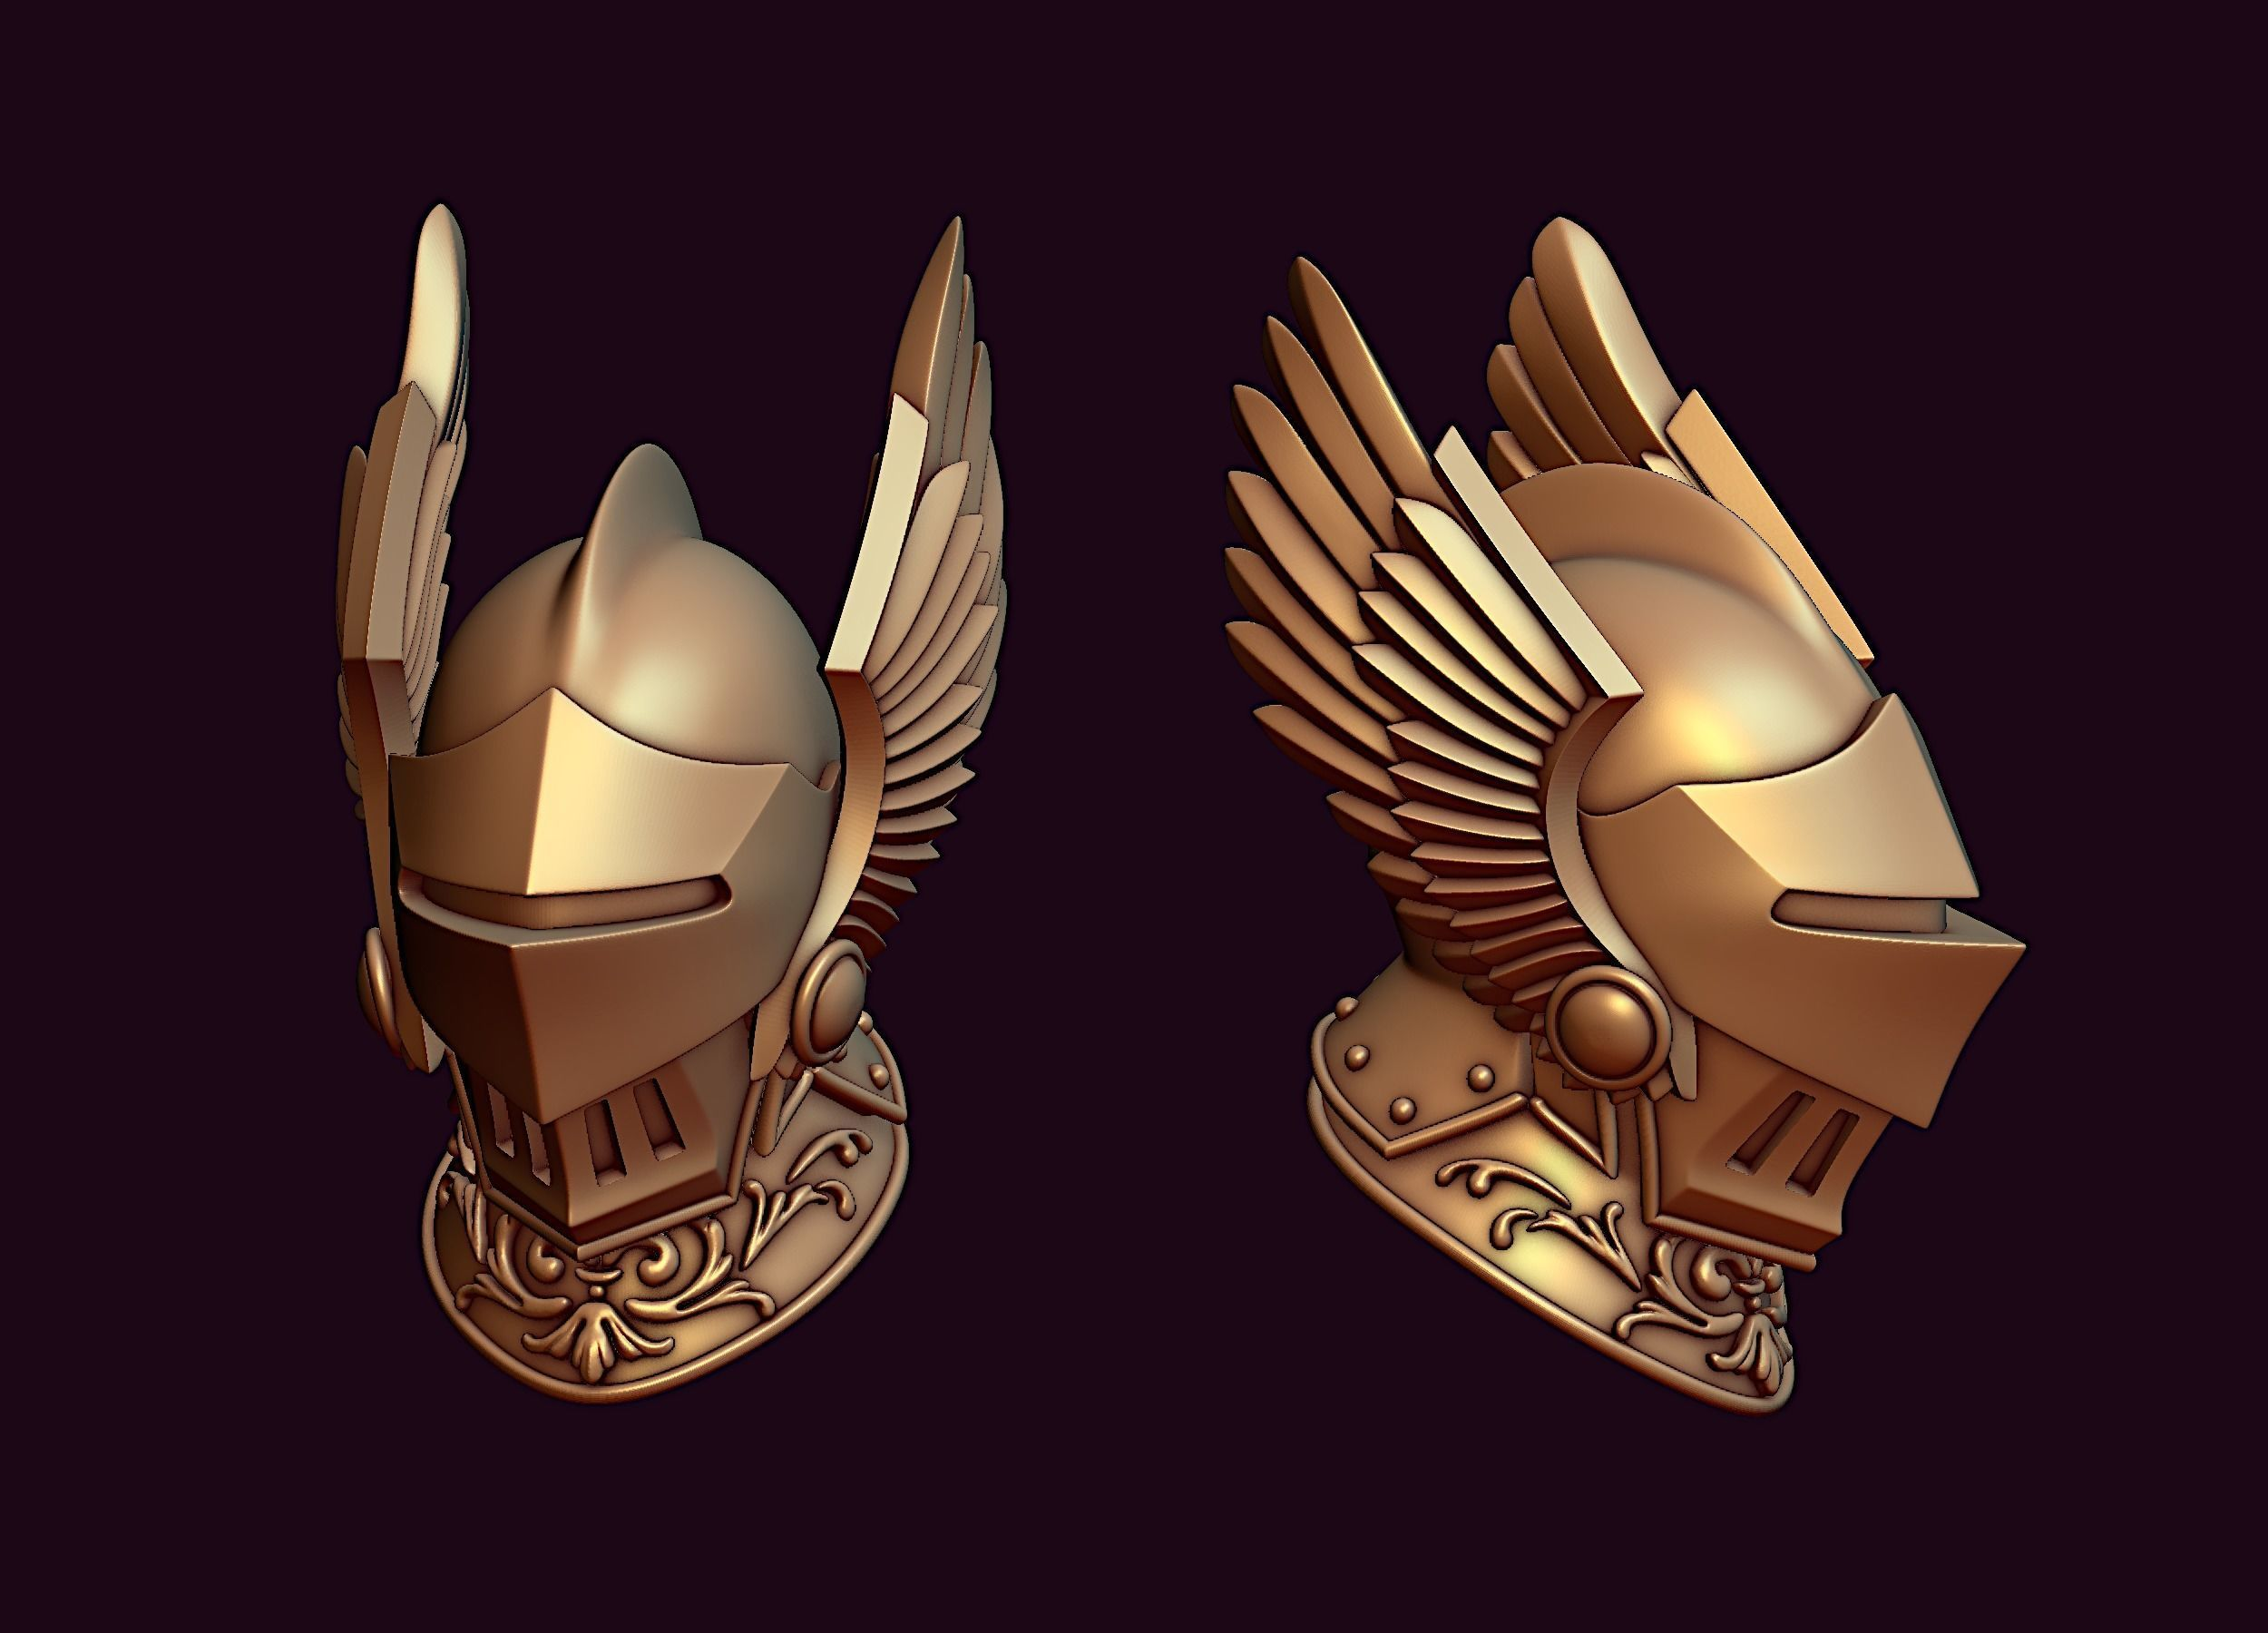 Knight winged helmet